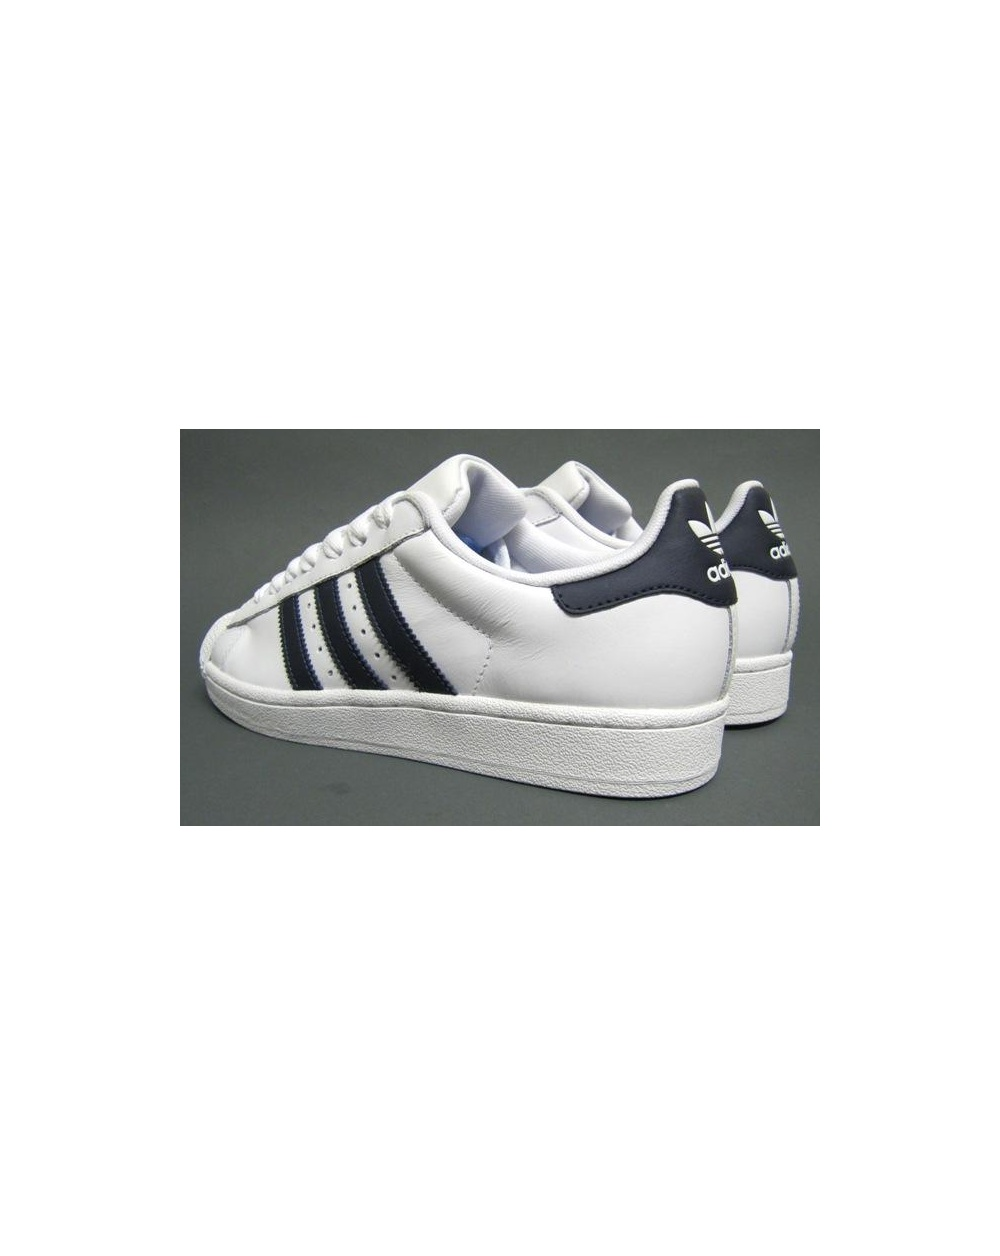 Adidas Superstar 2 Blanc Marine anYHBfbp